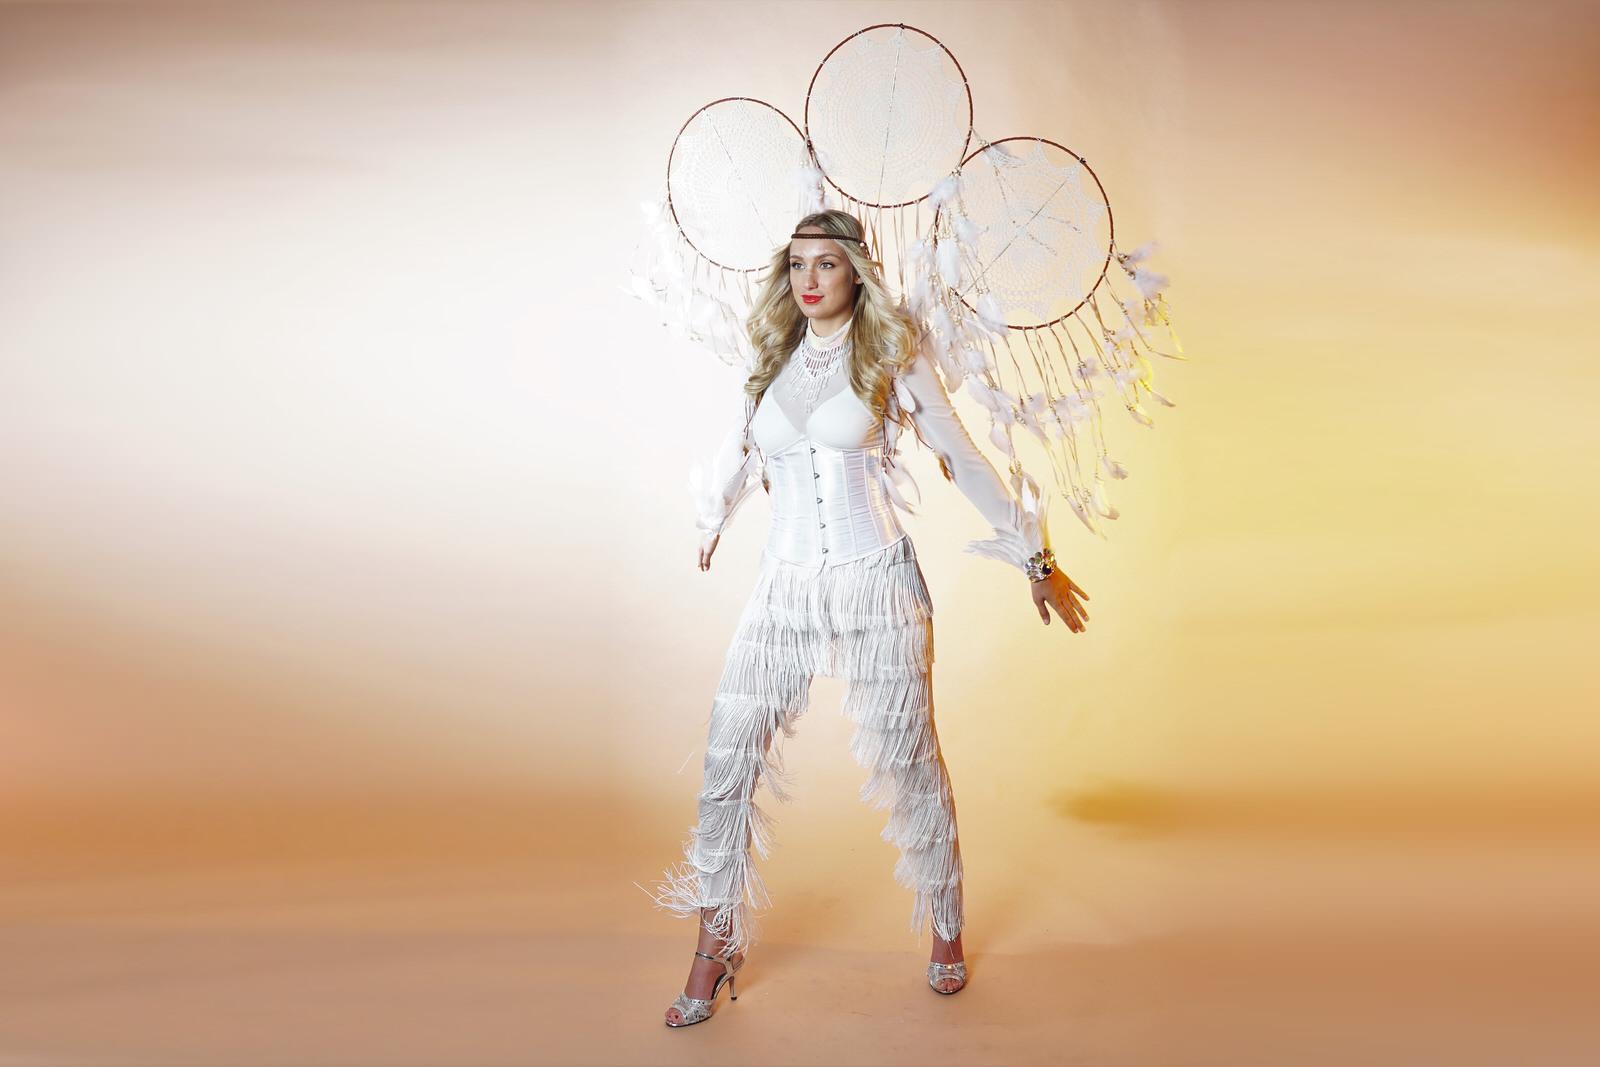 Dromenvanger, dream catcher, wit thema, thema event, zomer thema, thema kostuum, mobiel entertainment, event entertainment